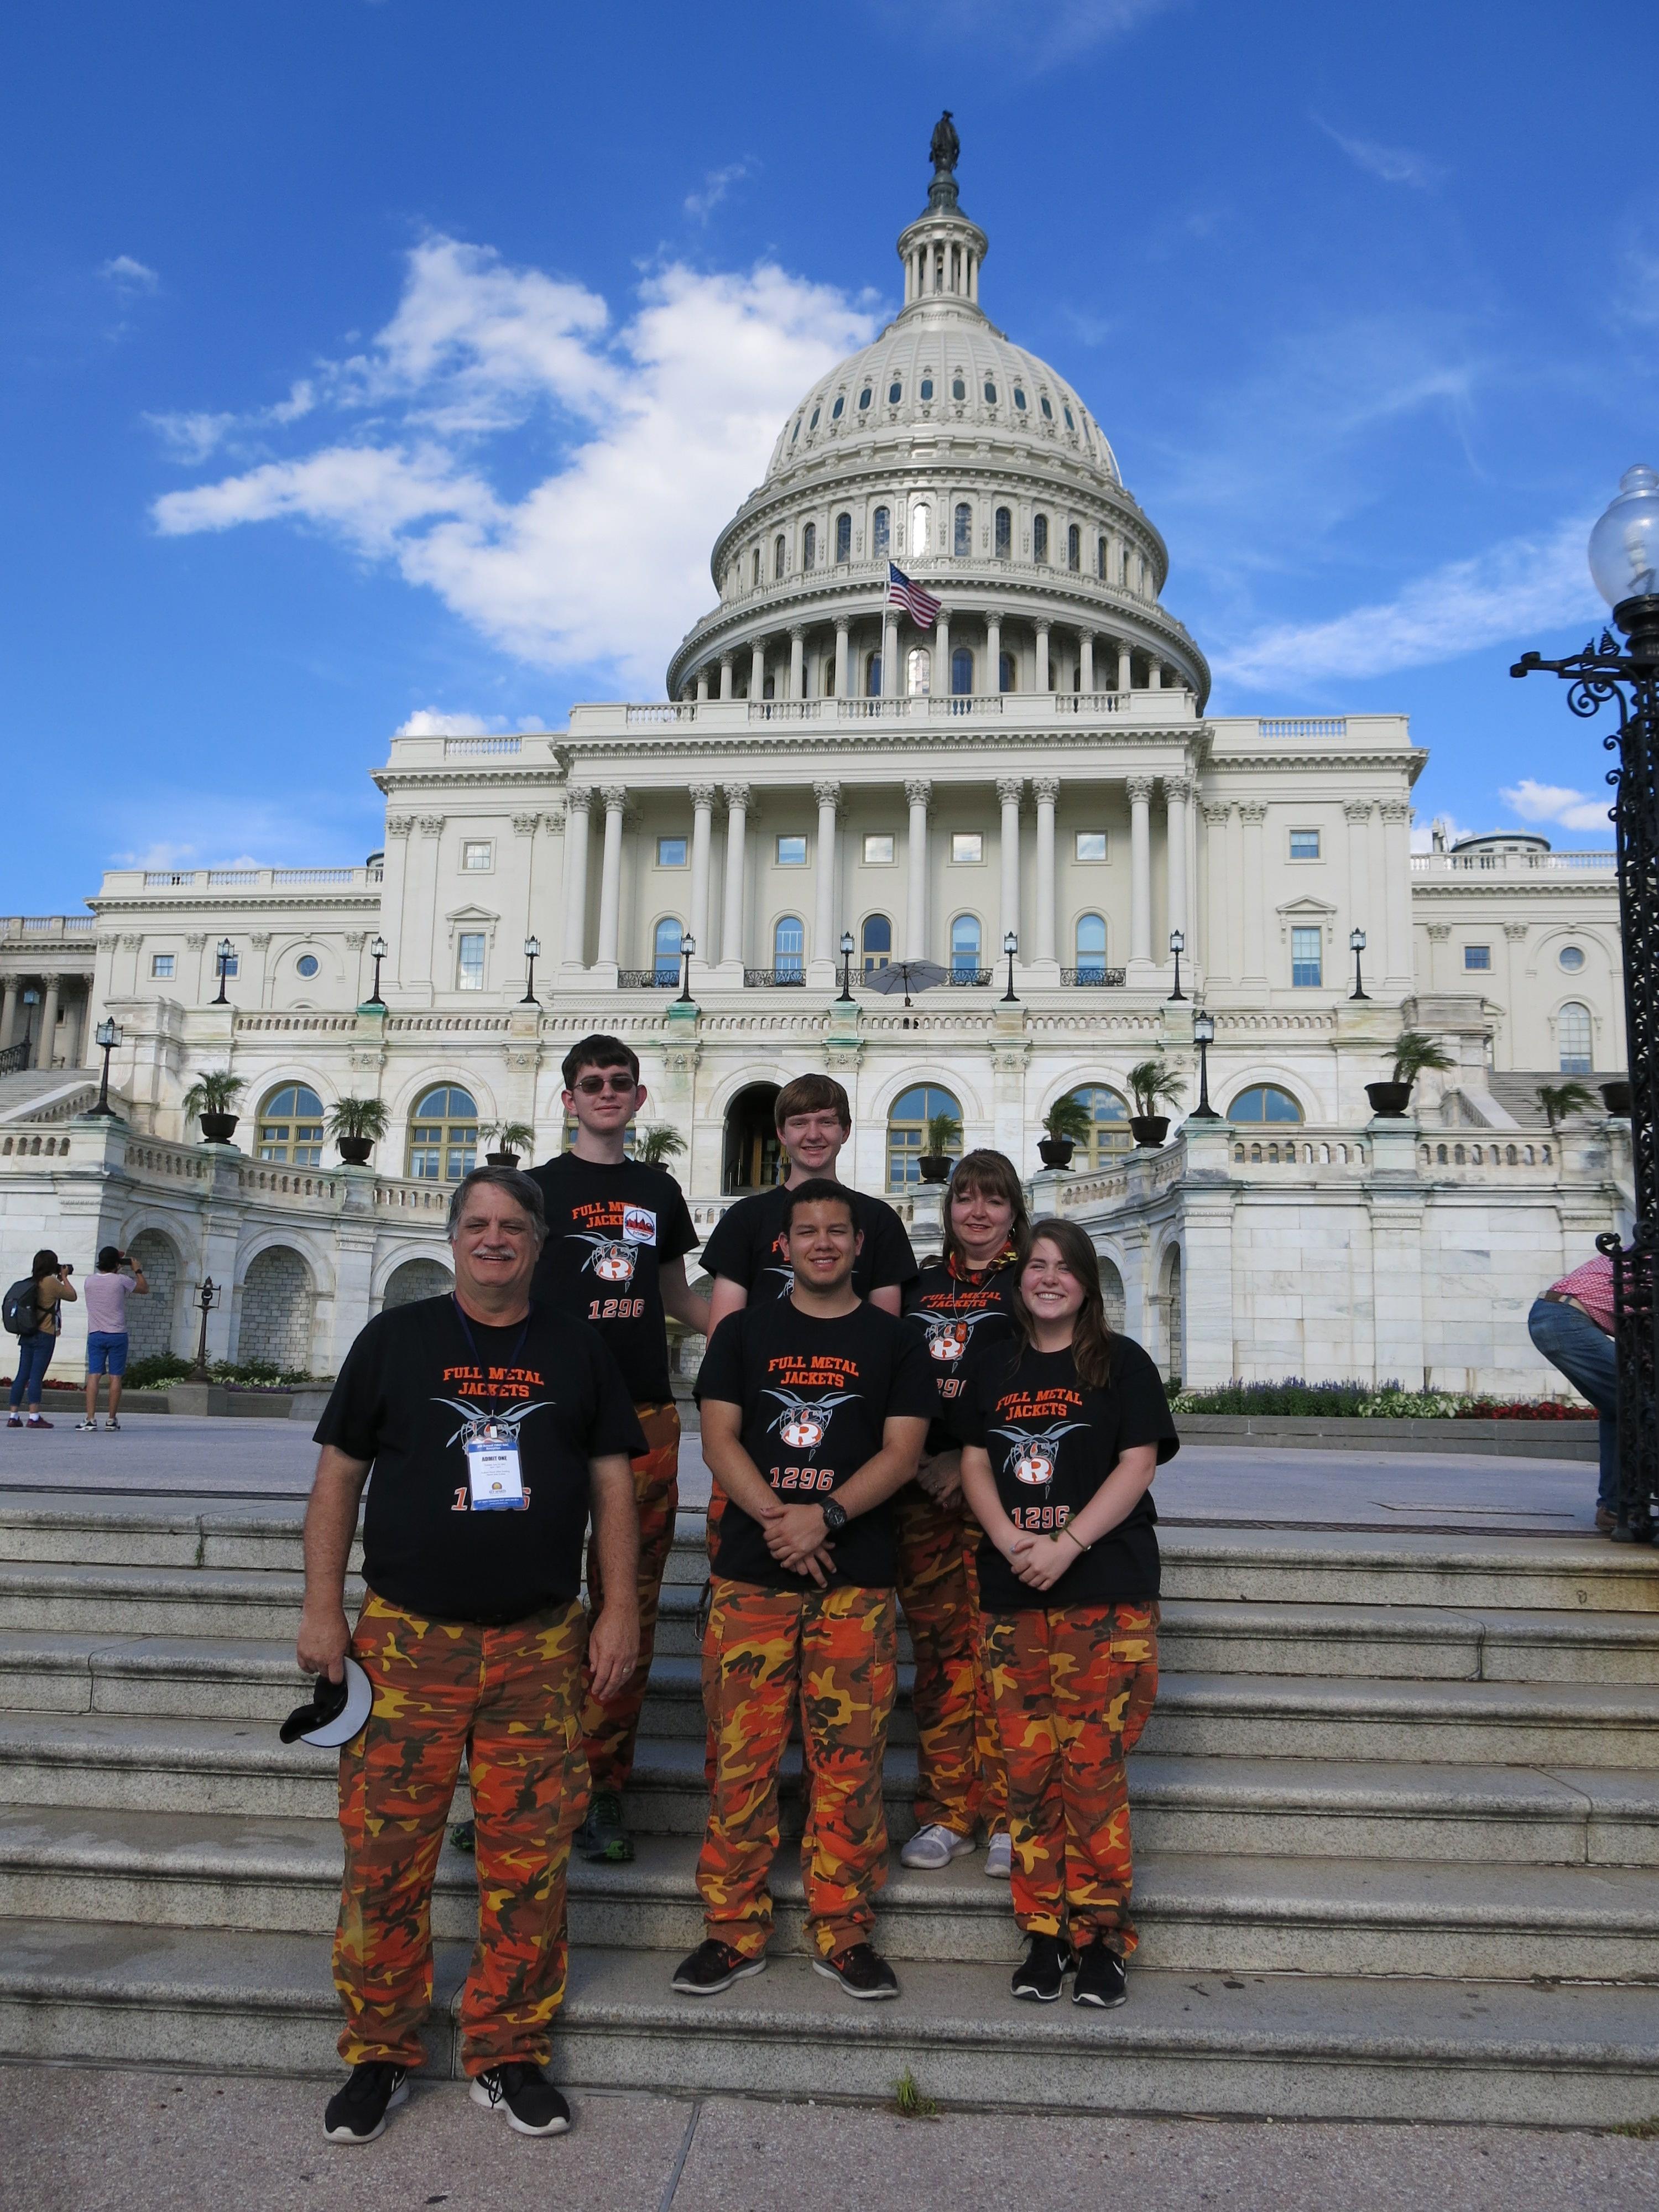 Rockwall High School Robotics Team takes field trip to Washington, D.C.